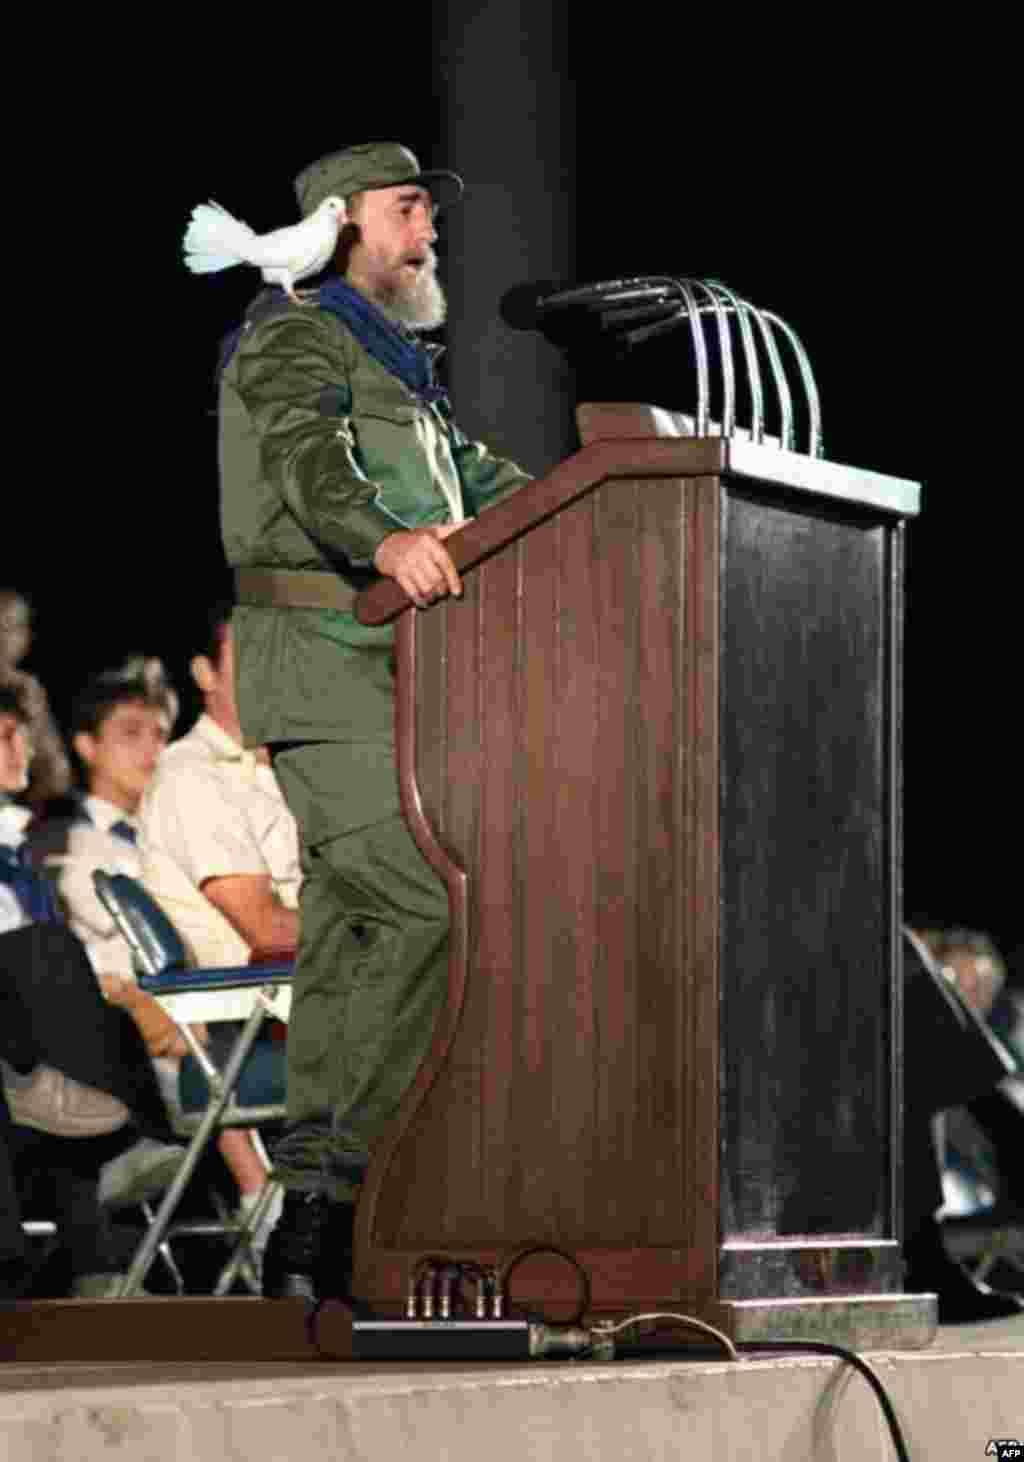 سخنرانی در مراسم سیامین سالگرد انقلاب کمونیستی کوبا